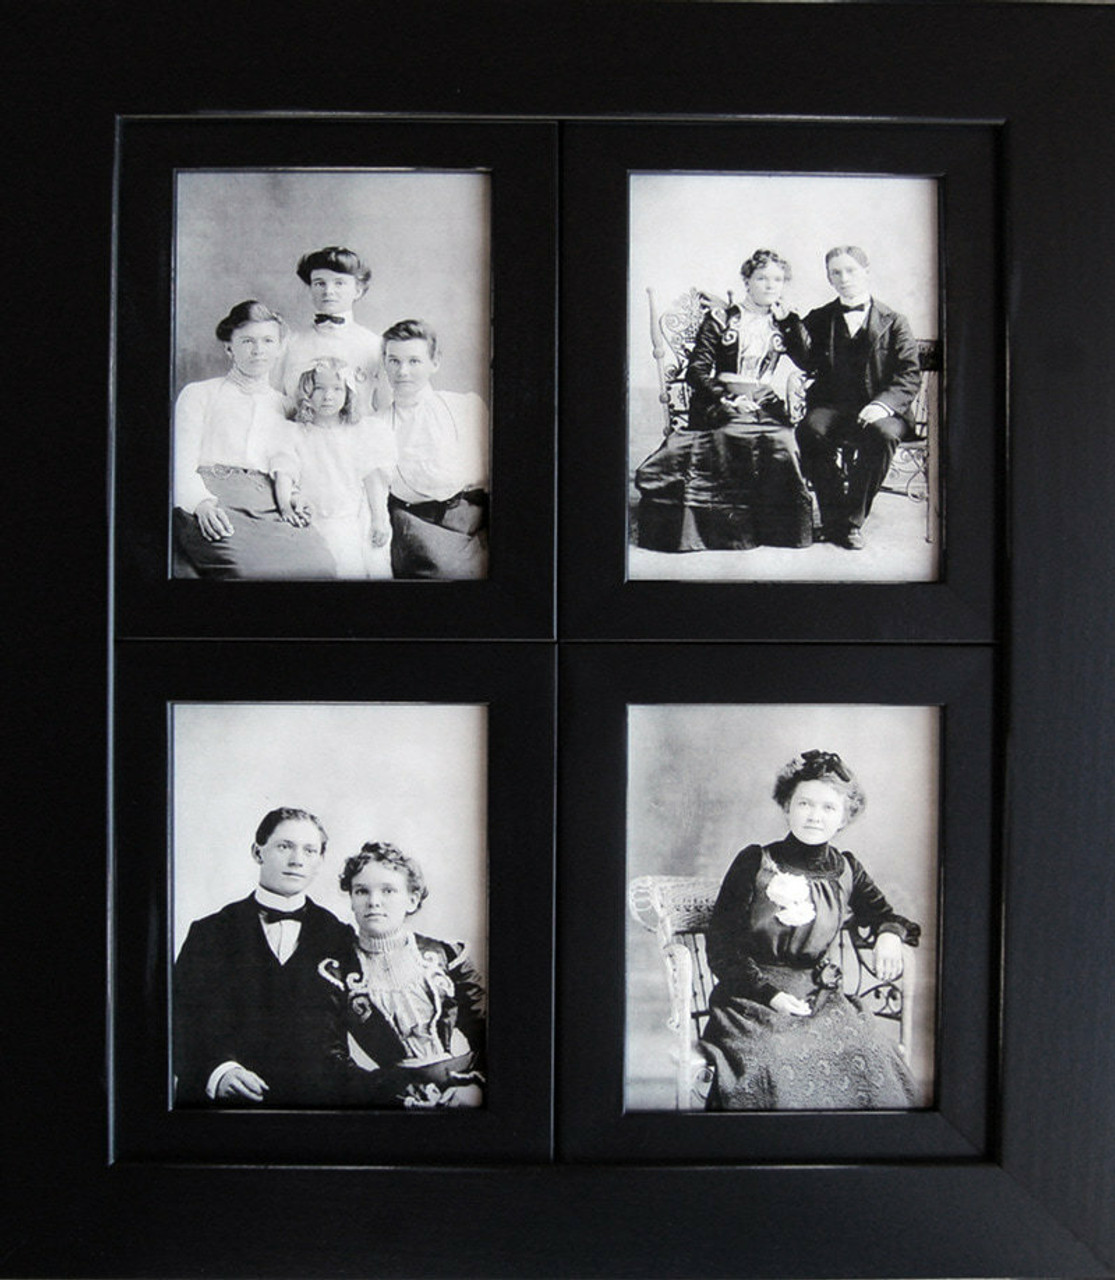 Window Pane Collage Frame 8x10 Openings Black Distressed